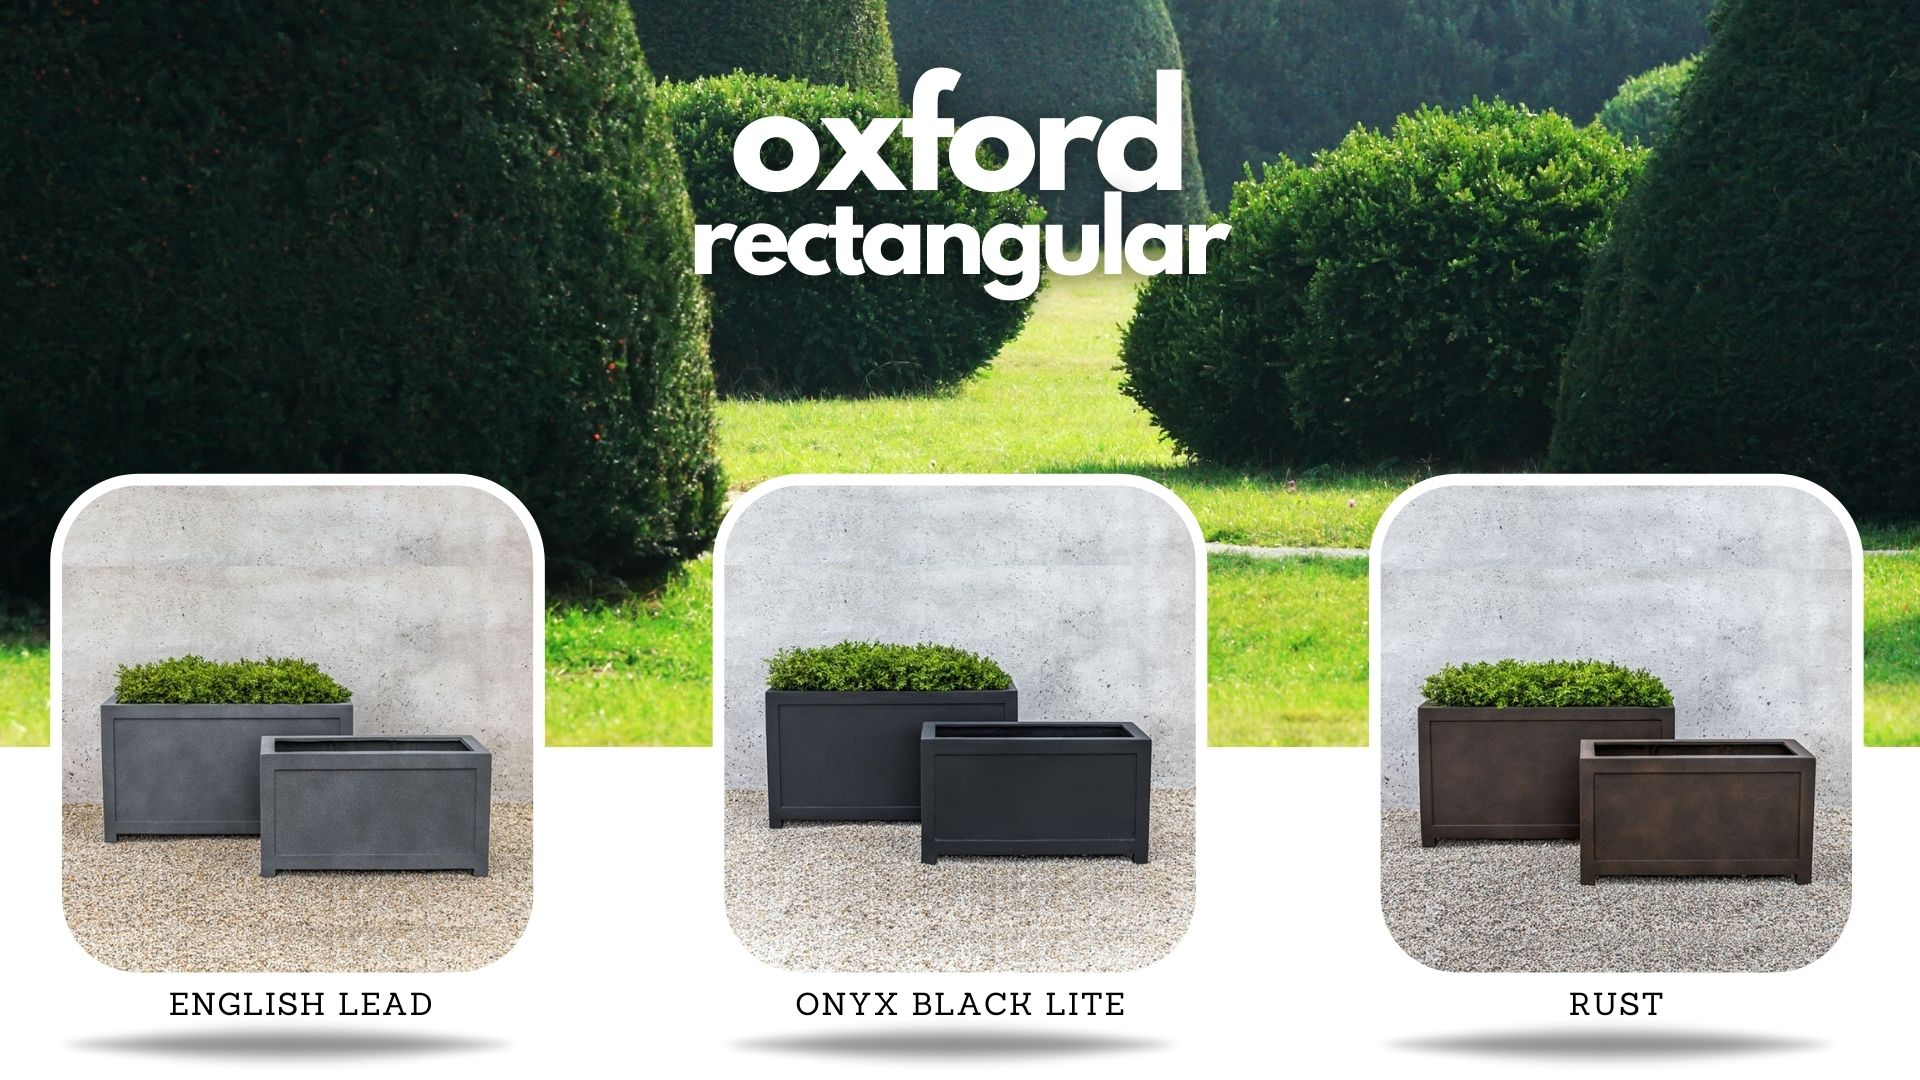 oxford-rectangular-planter-campania